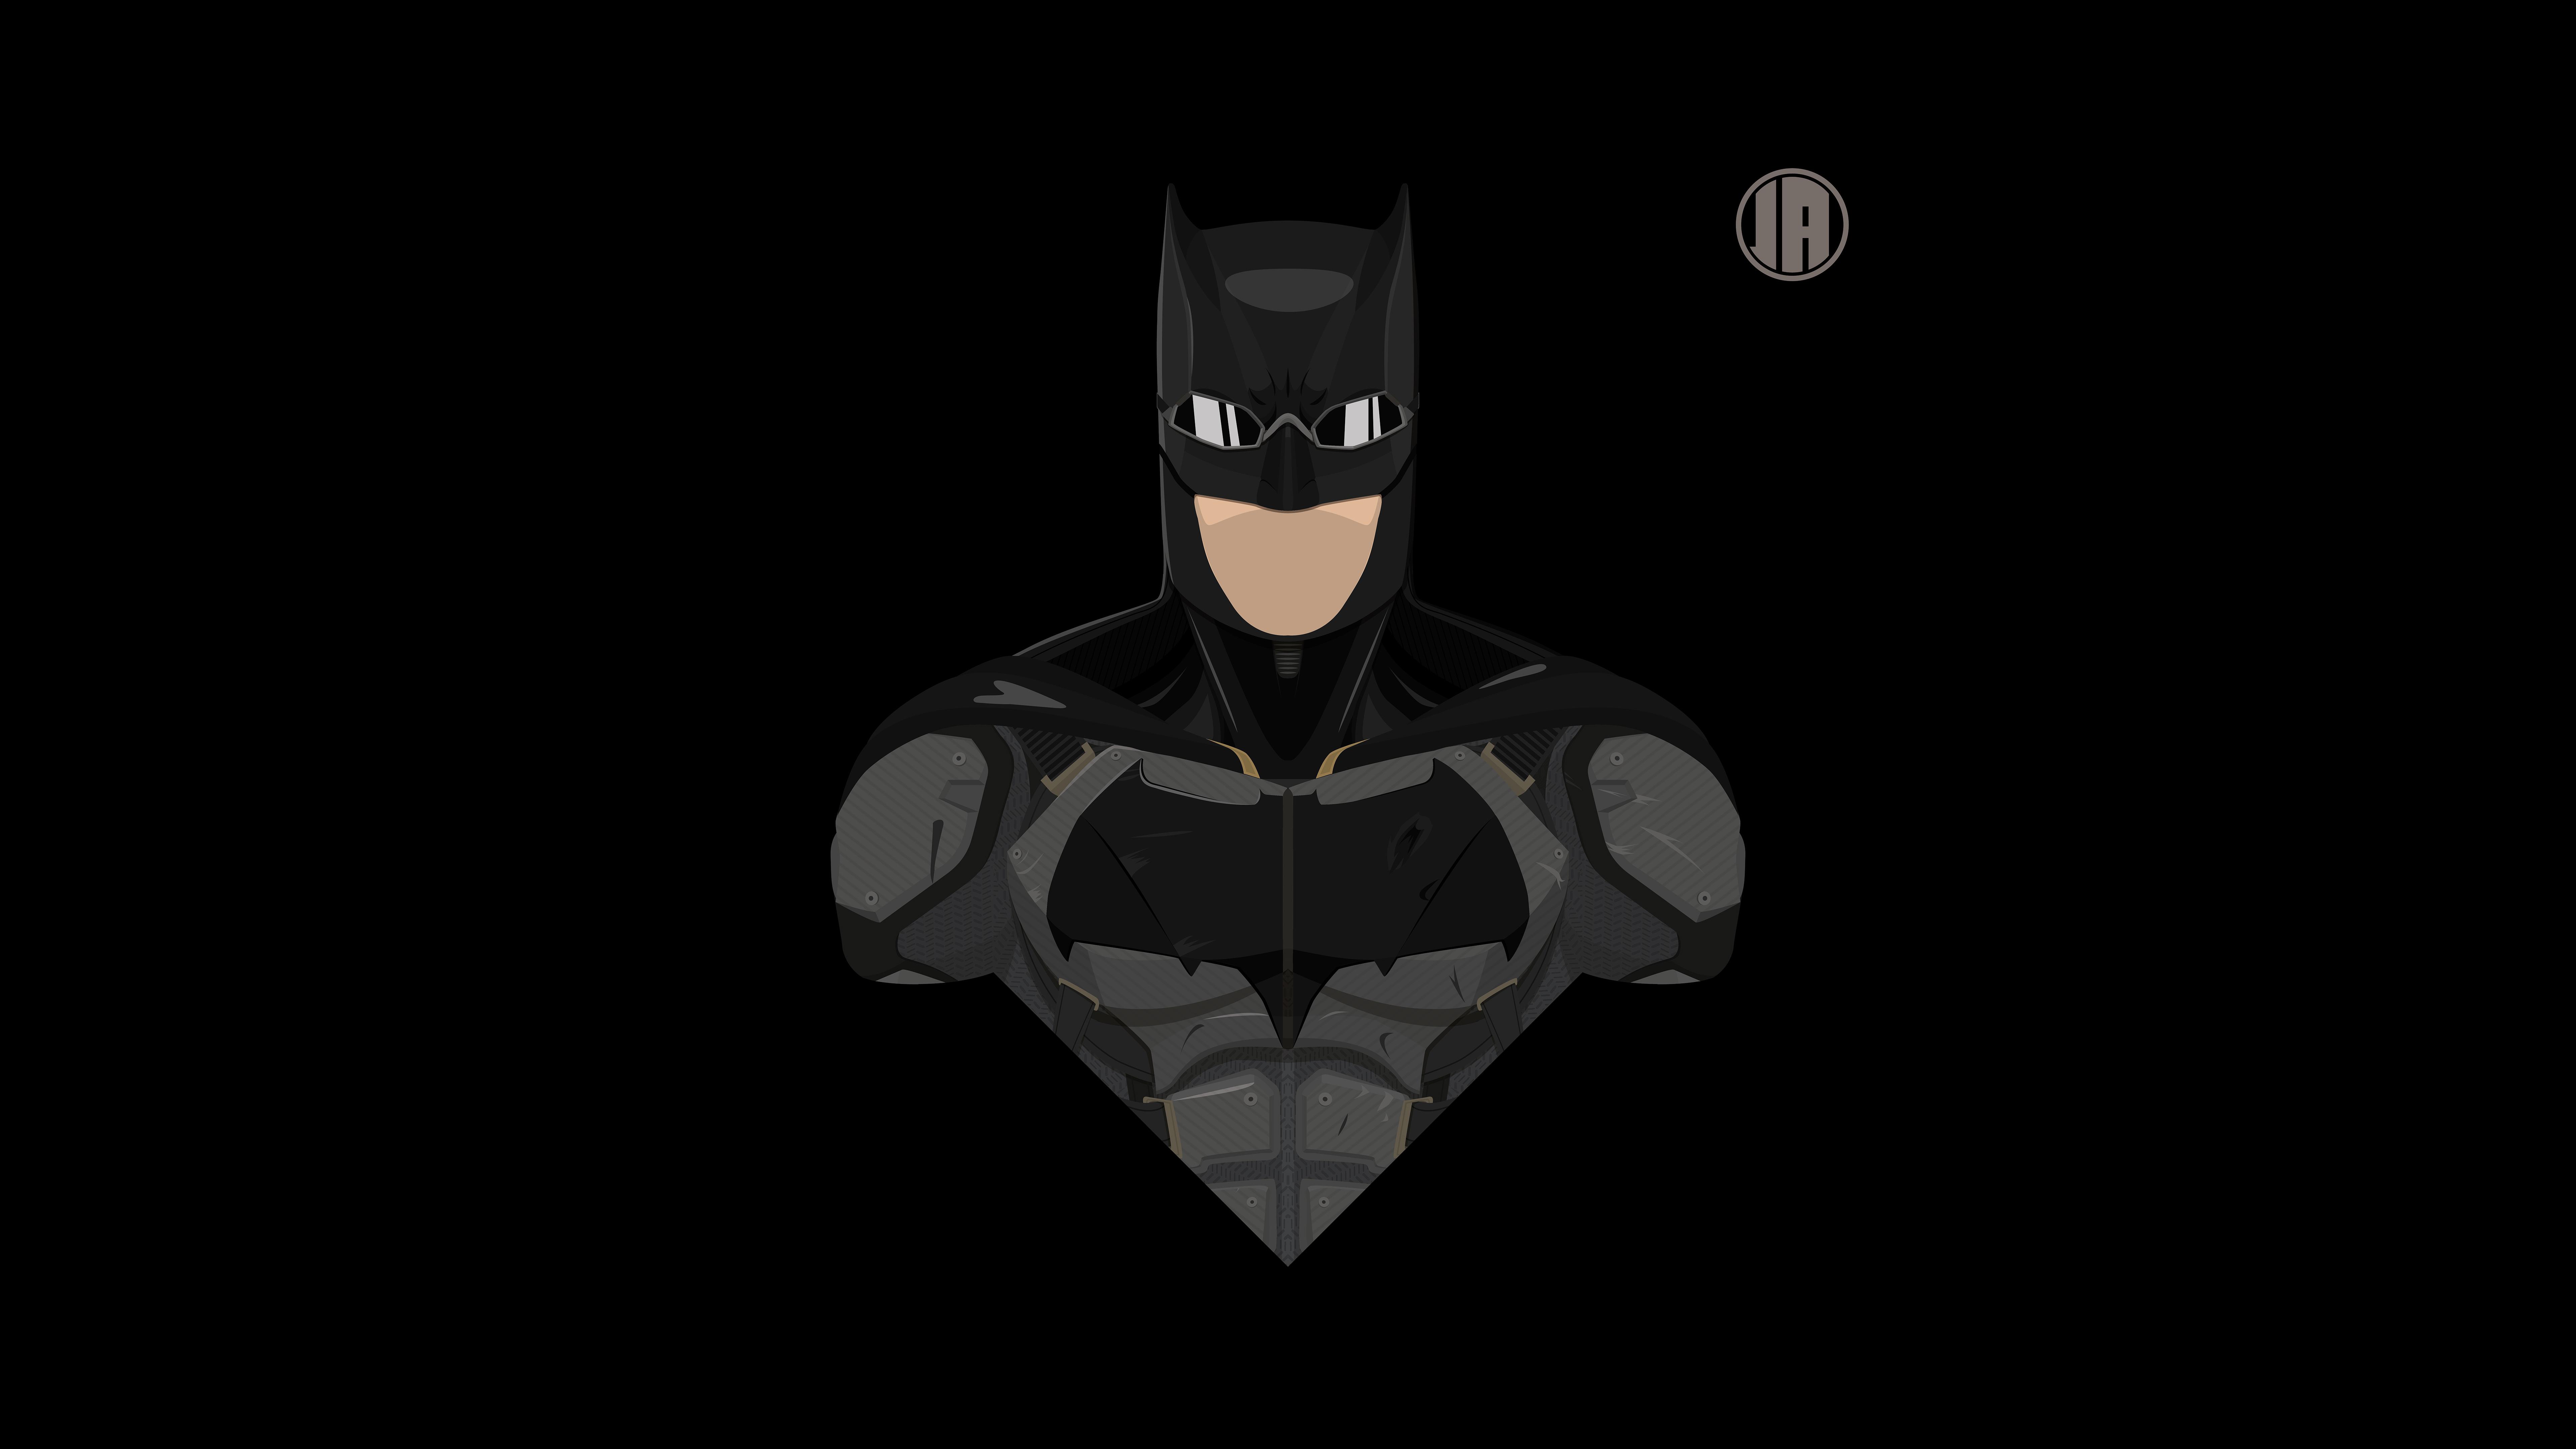 Batman DCEU Tactical Suit Minimalism 8k